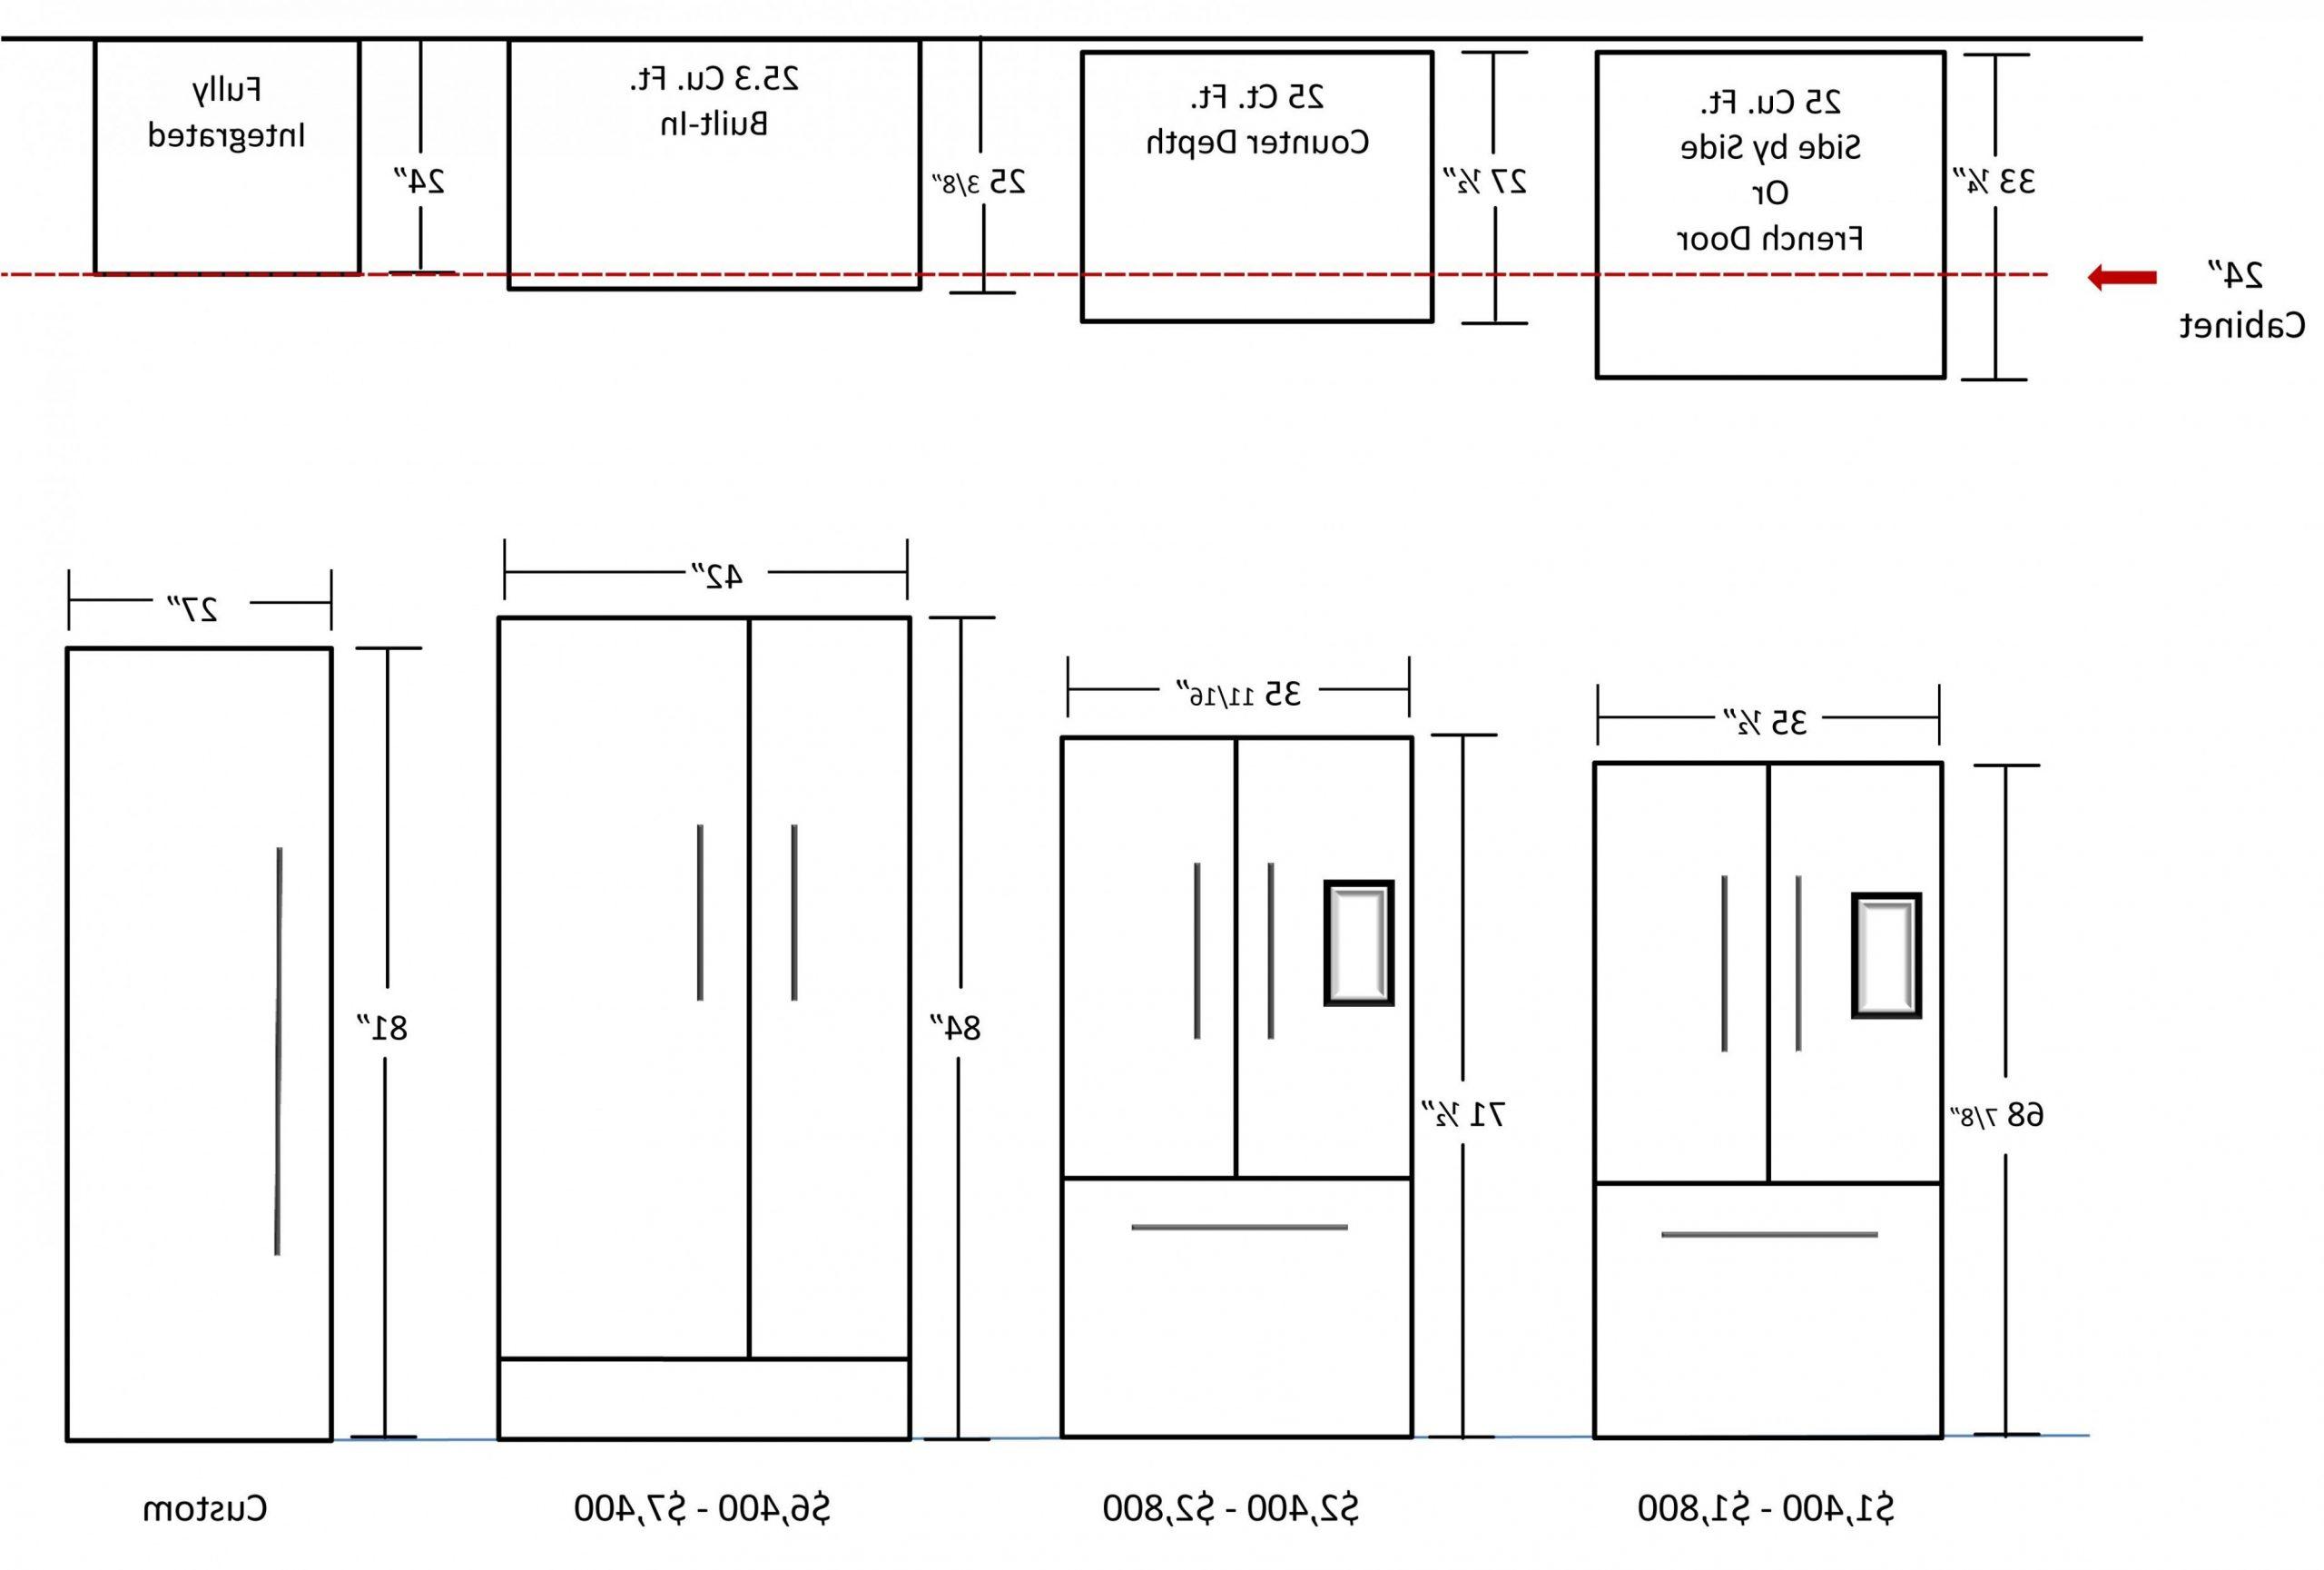 kitchen dimensions fridge pinteres from Kitchen Appliance Dimensions - Kitchen Cabinet Dimensions Refrigerator